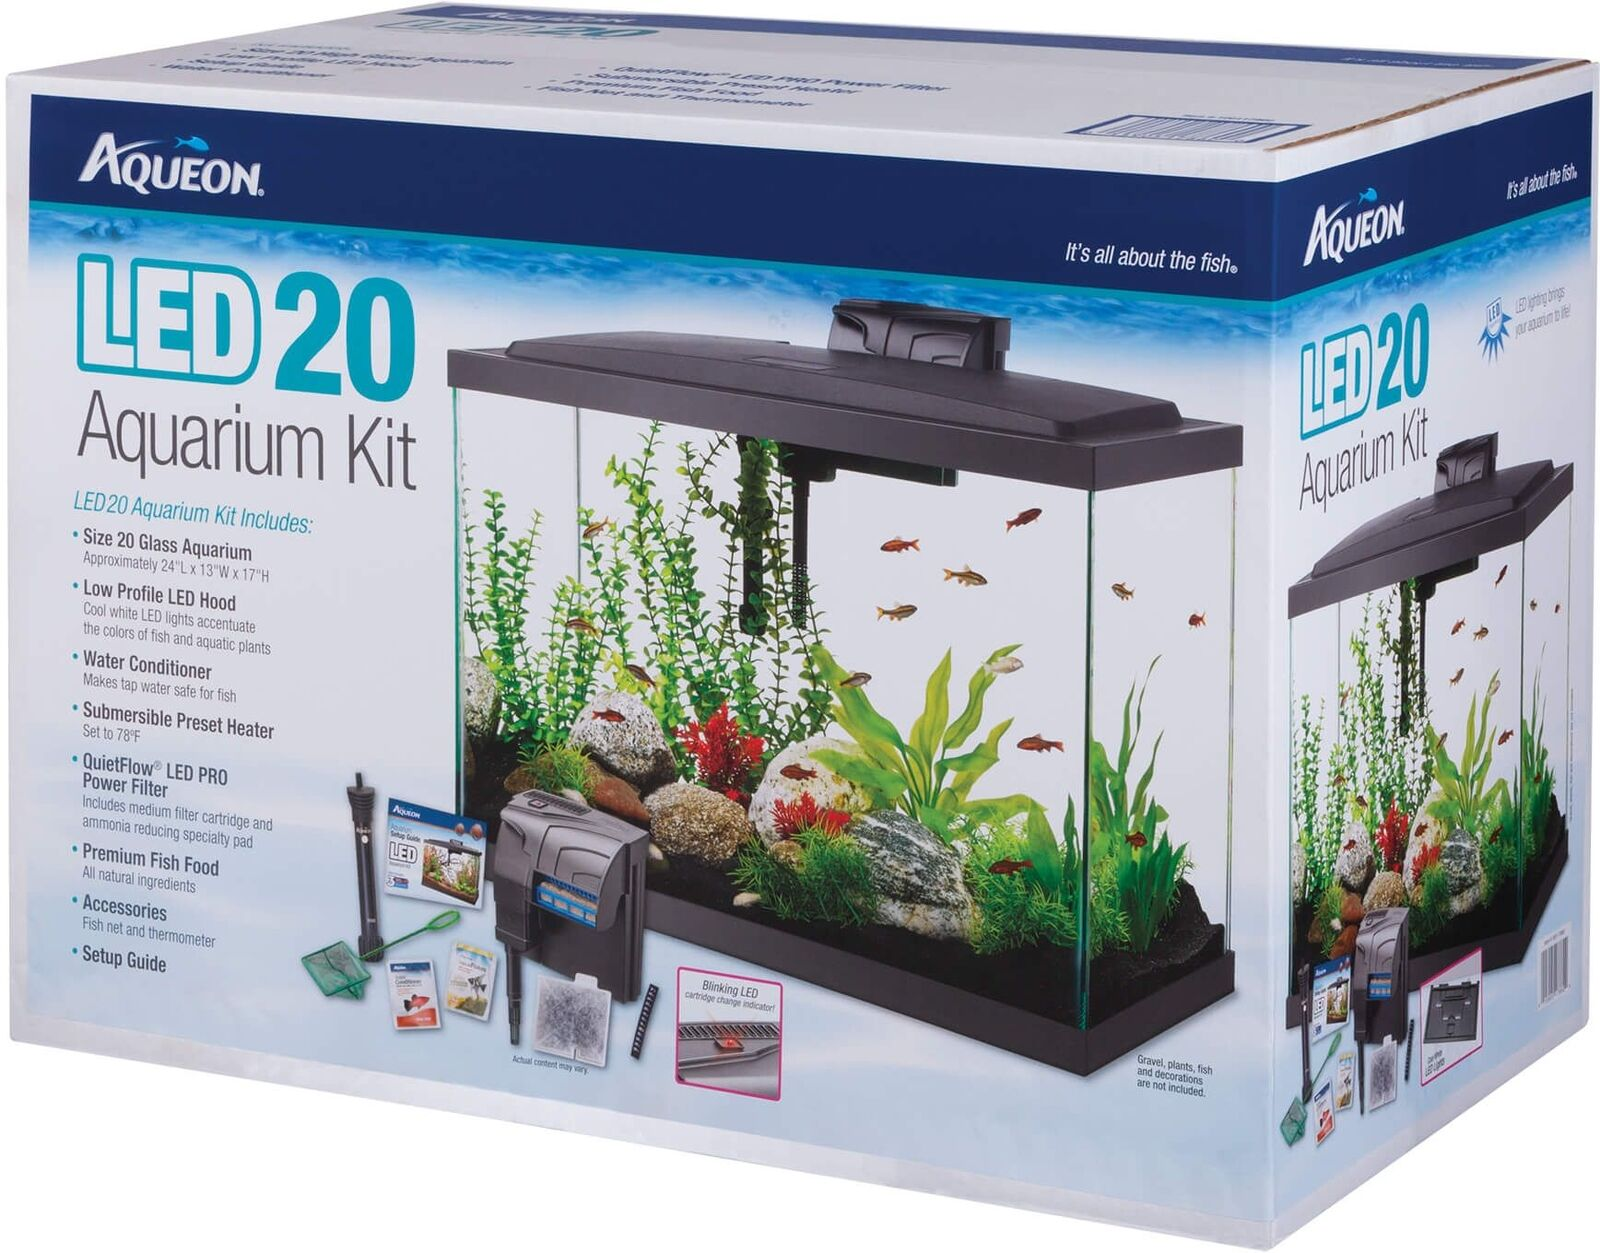 led the reef aquarium of smart owning light lights global future tech